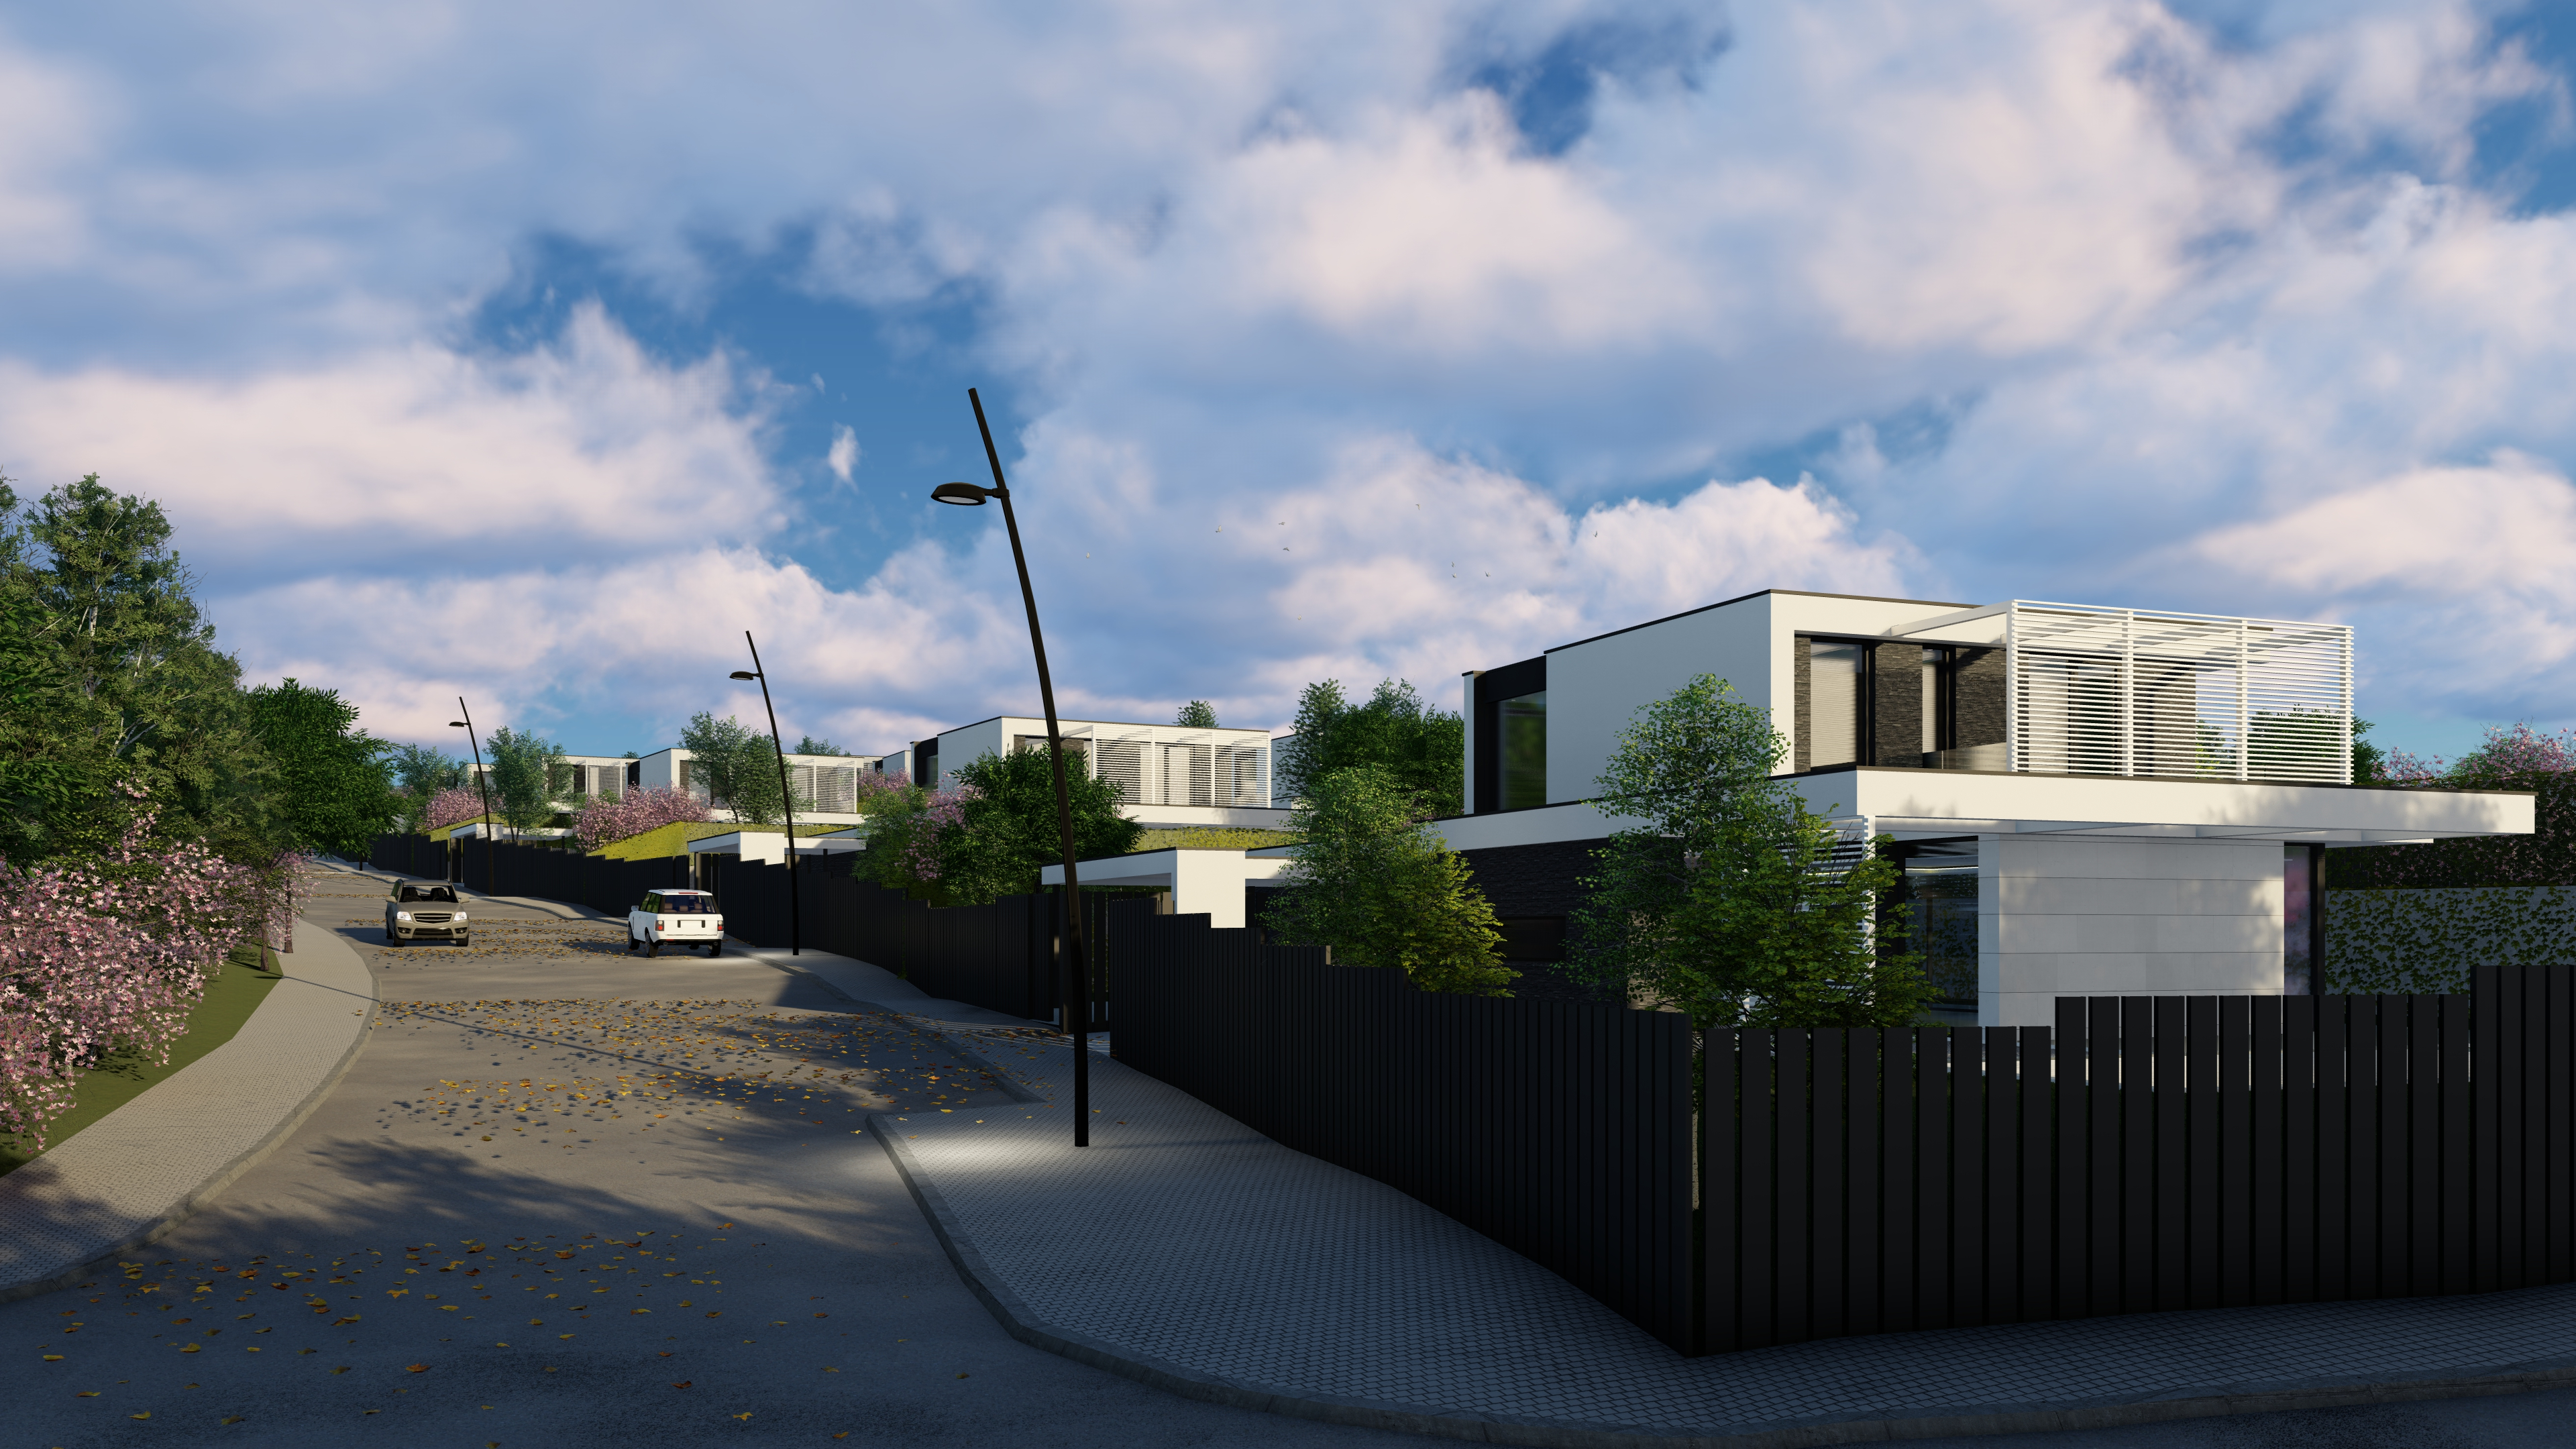 Proyecto de FH2L Arquitectos QHomes14 Satelites en Majadahonda, Madrid